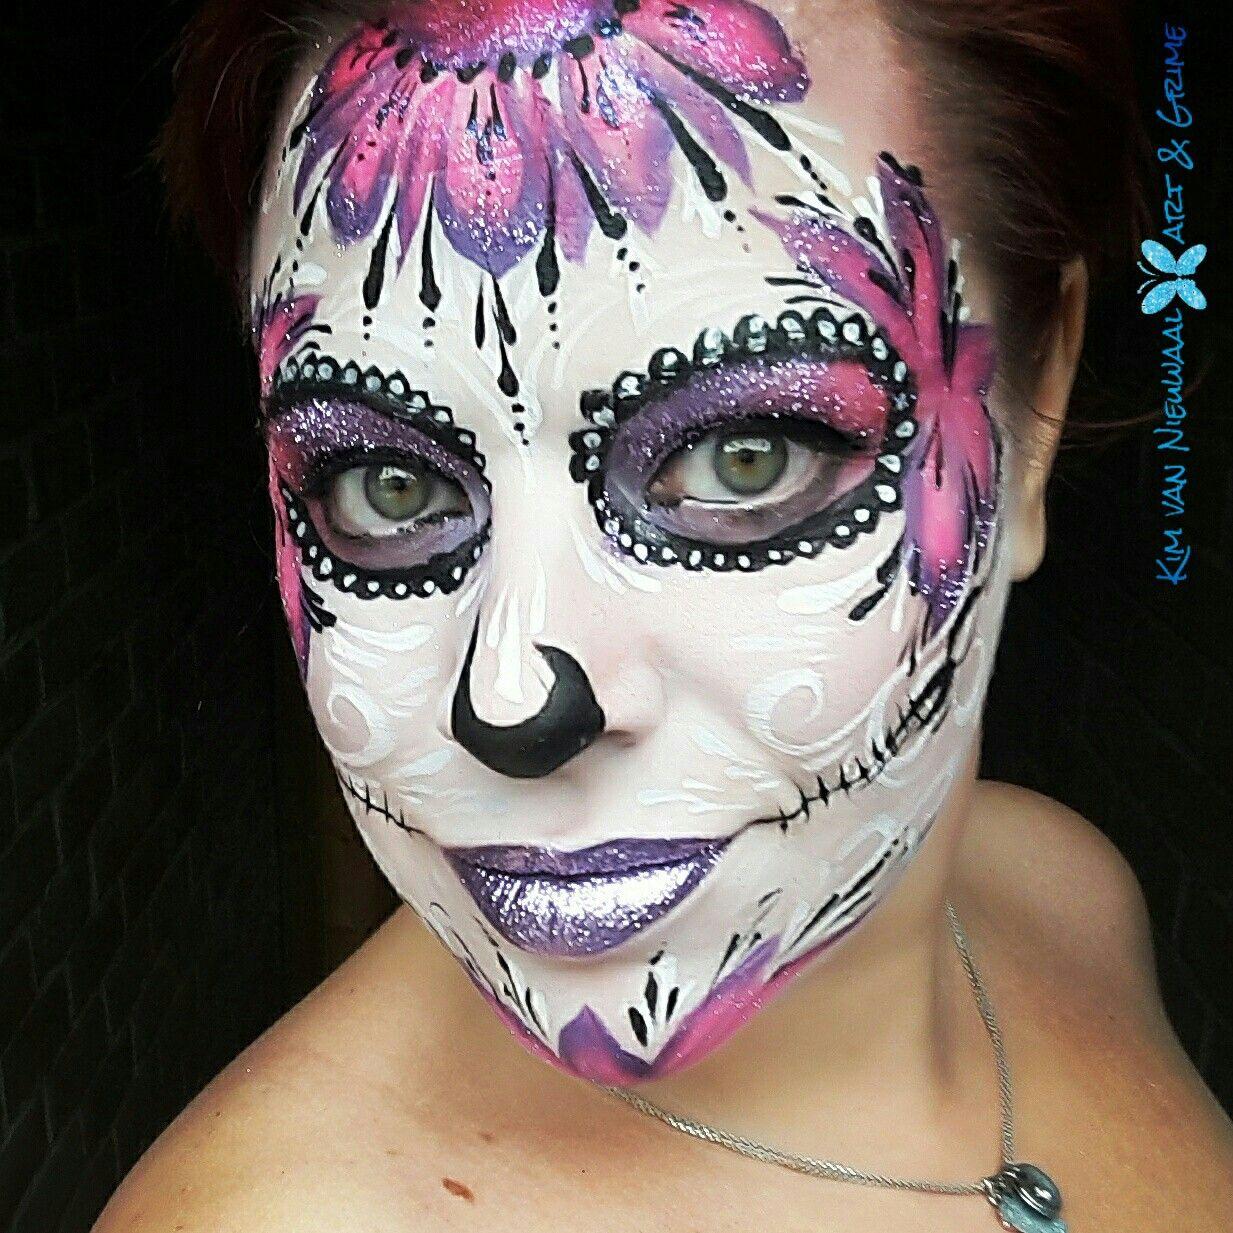 Sugarskull inspired by Vanessa Mendoza with glitterlips